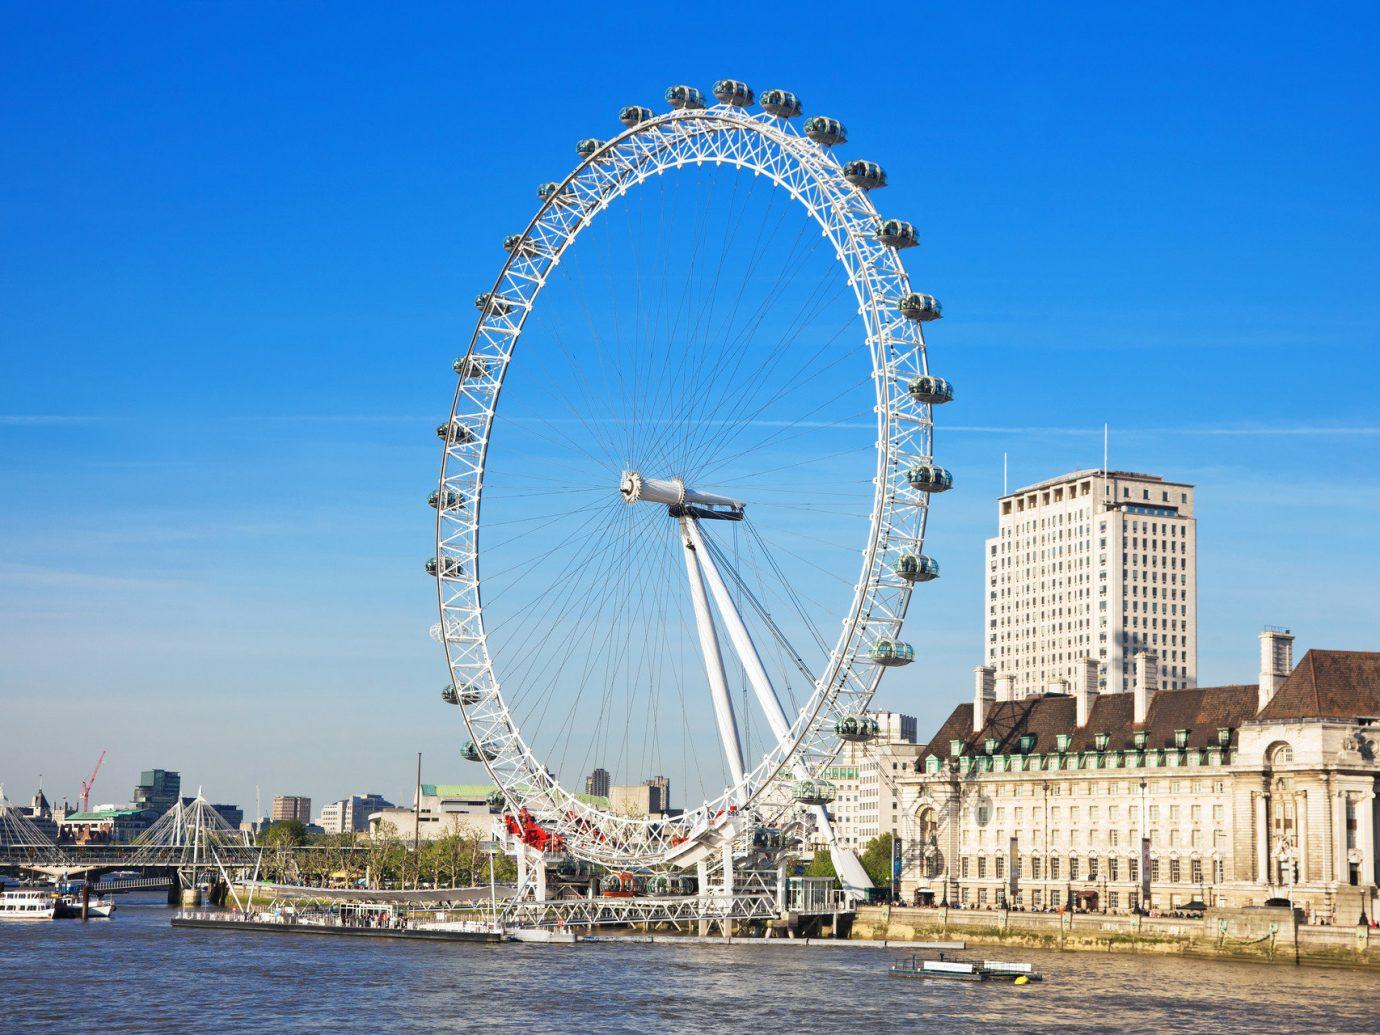 Budget sky outdoor ferris wheel landmark tourist attraction cityscape amusement park tower Sea arch ride